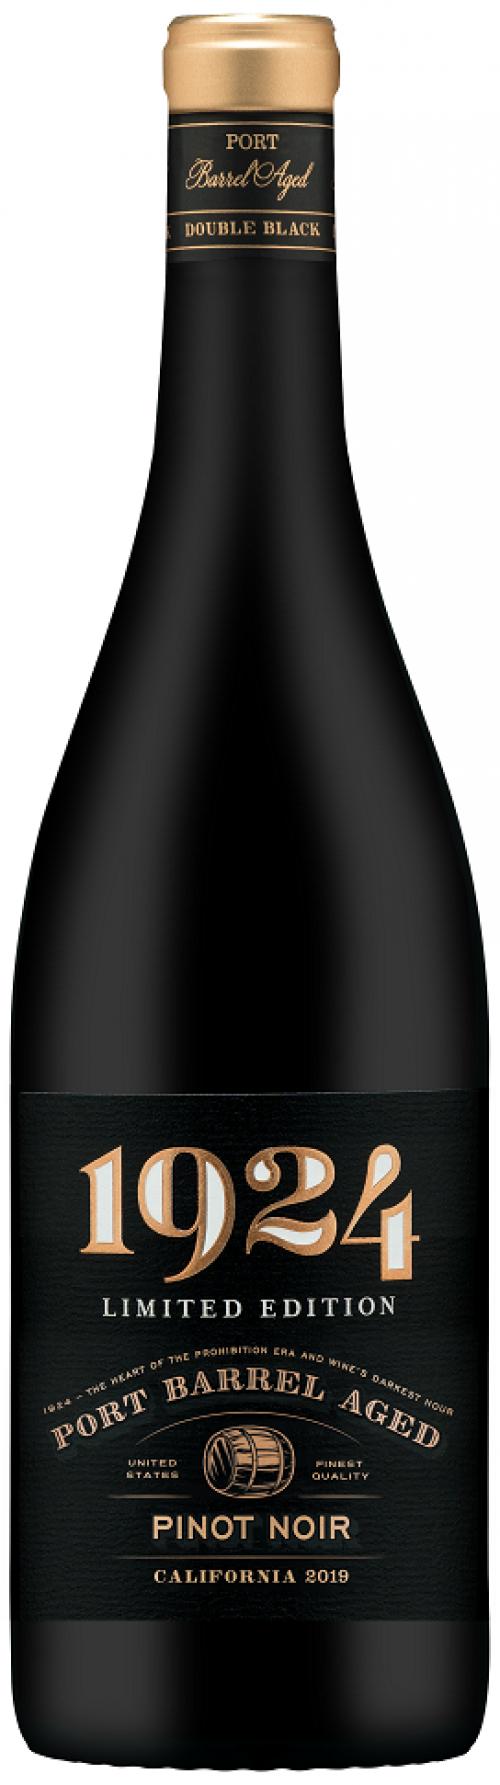 Gnarly Head 1924 Port Barrel Pinot Noir 750ml NV